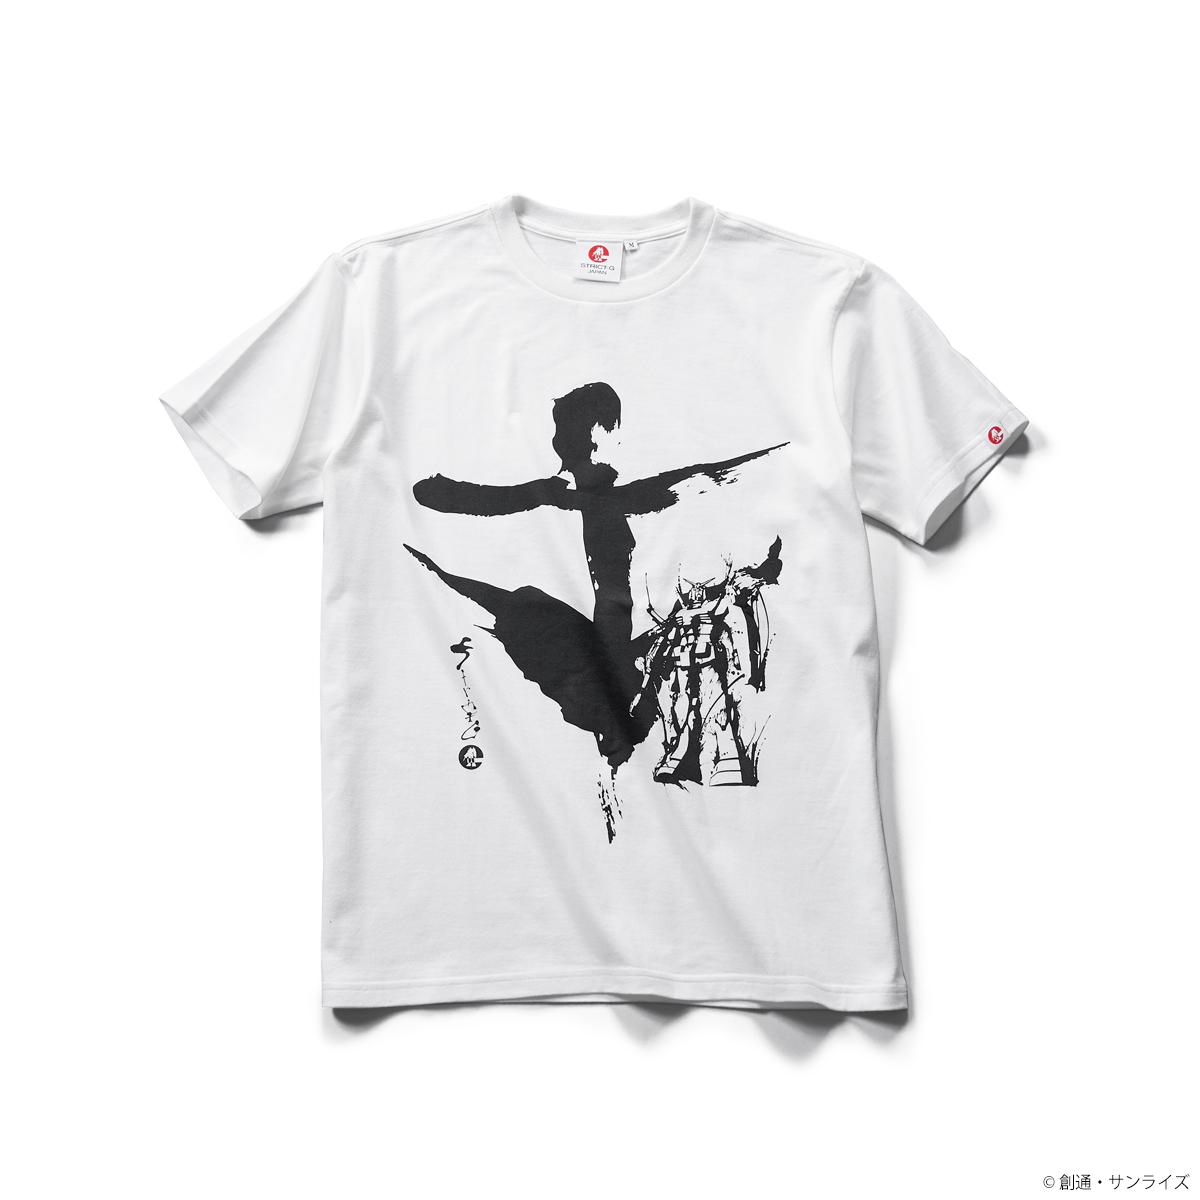 STRICT-G JAPAN 「機動戰士鋼彈」水墨筆觸風 地球聯邦軍 T恤